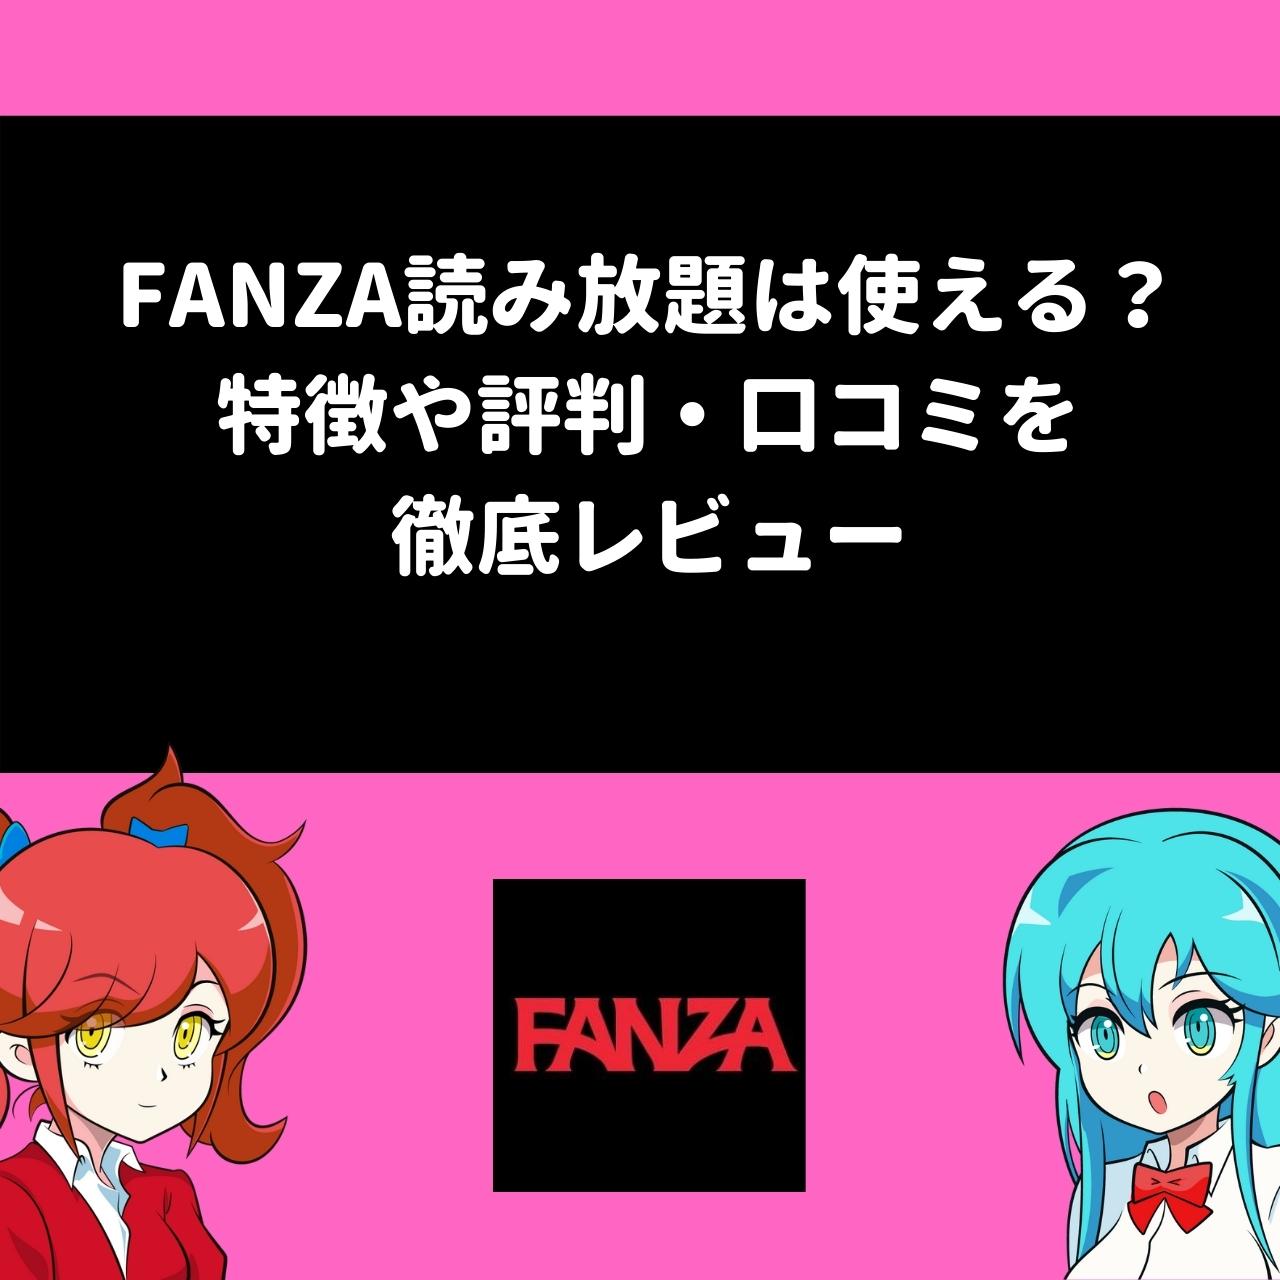 FANZA読み放題は使える?特徴や評判・口コミを徹底レビュー